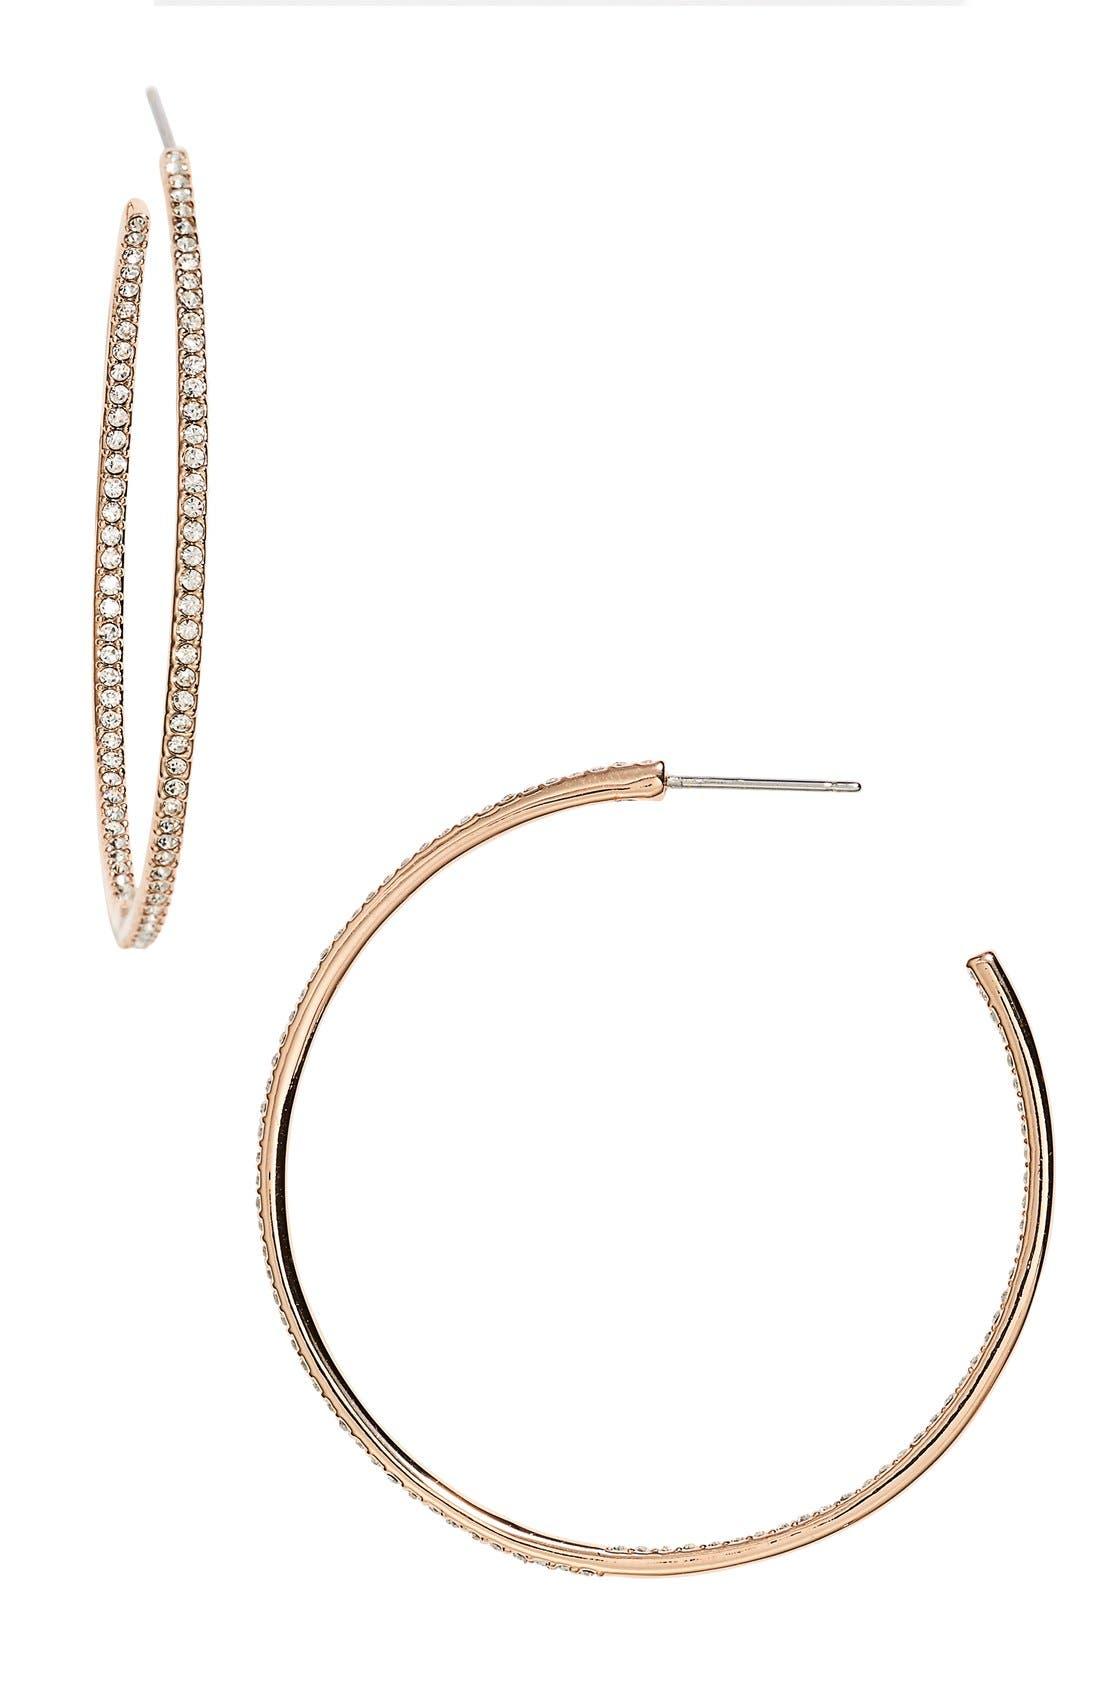 Medium Inside Out Hoop Earrings,                         Main,                         color, ROSE GOLD